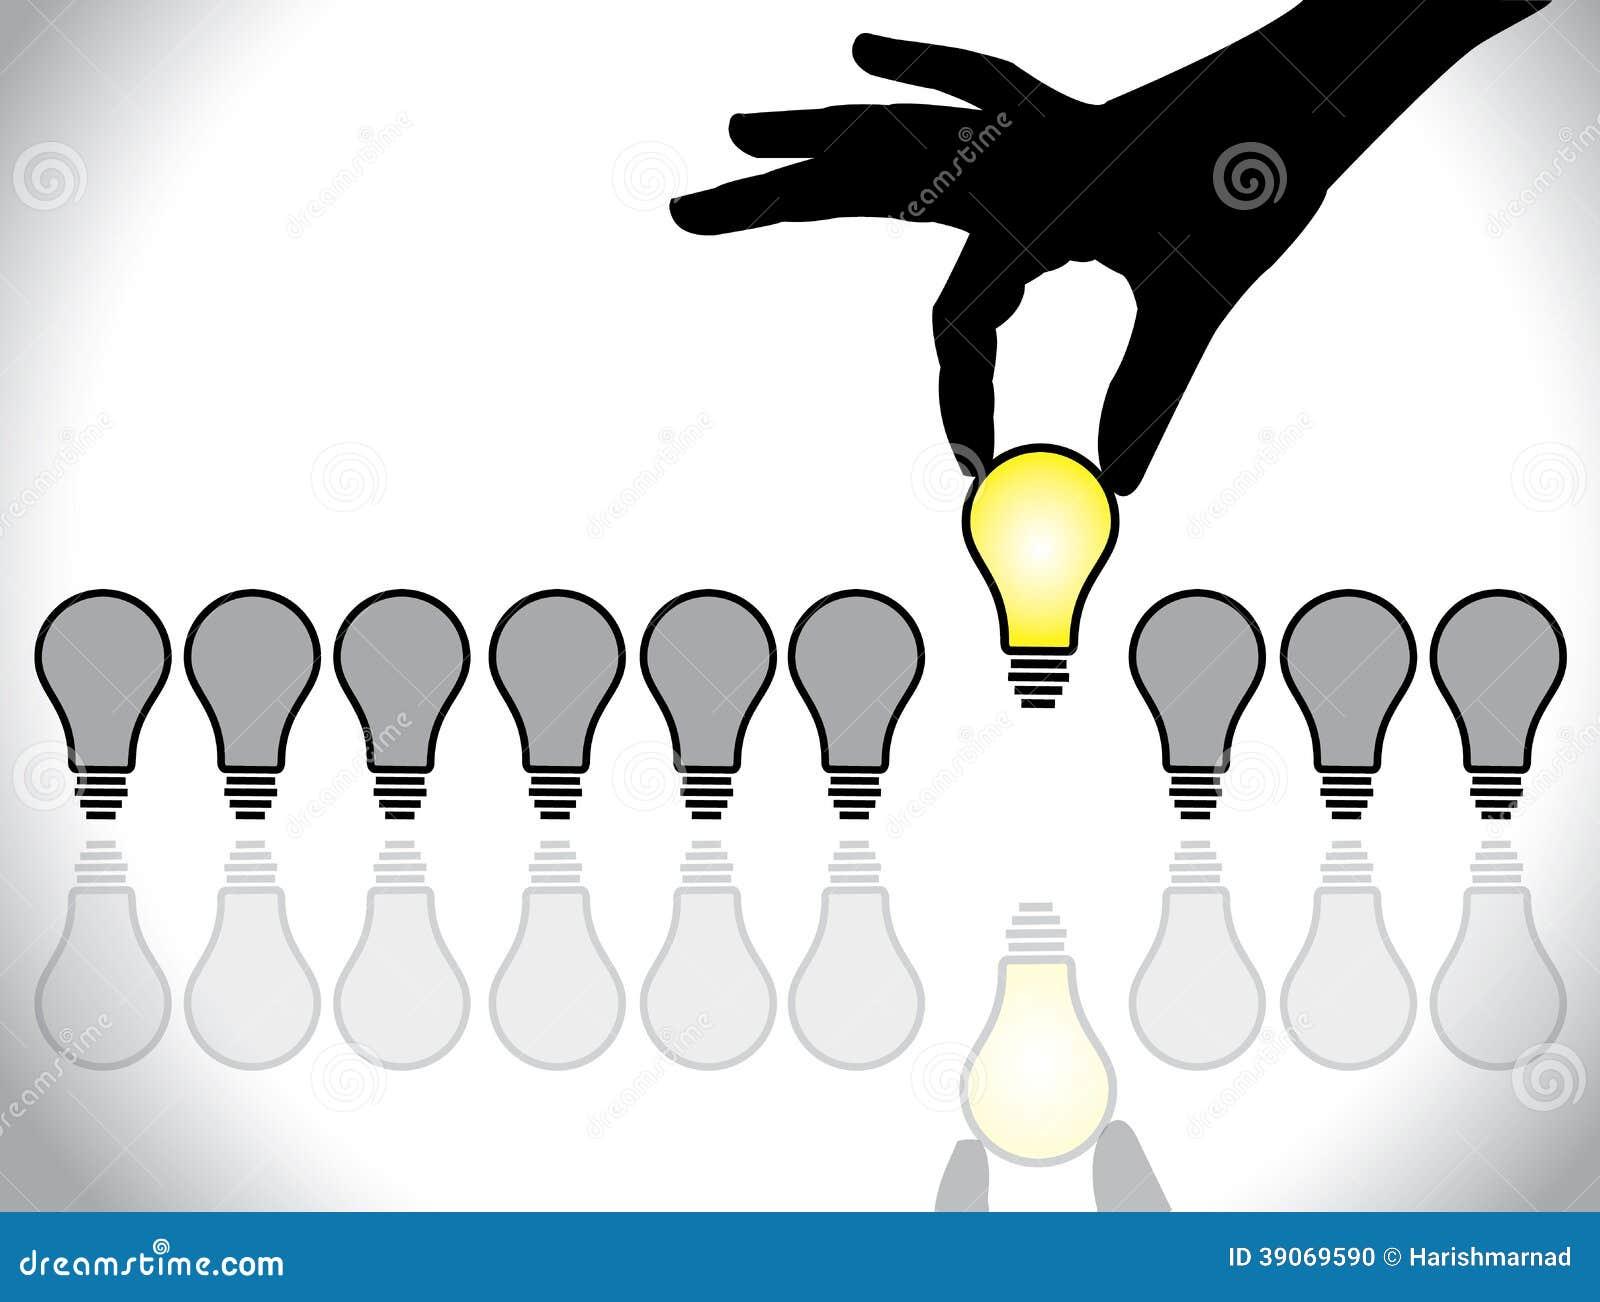 Choosing The Best Idea Lightbulb Concept Stock Vector